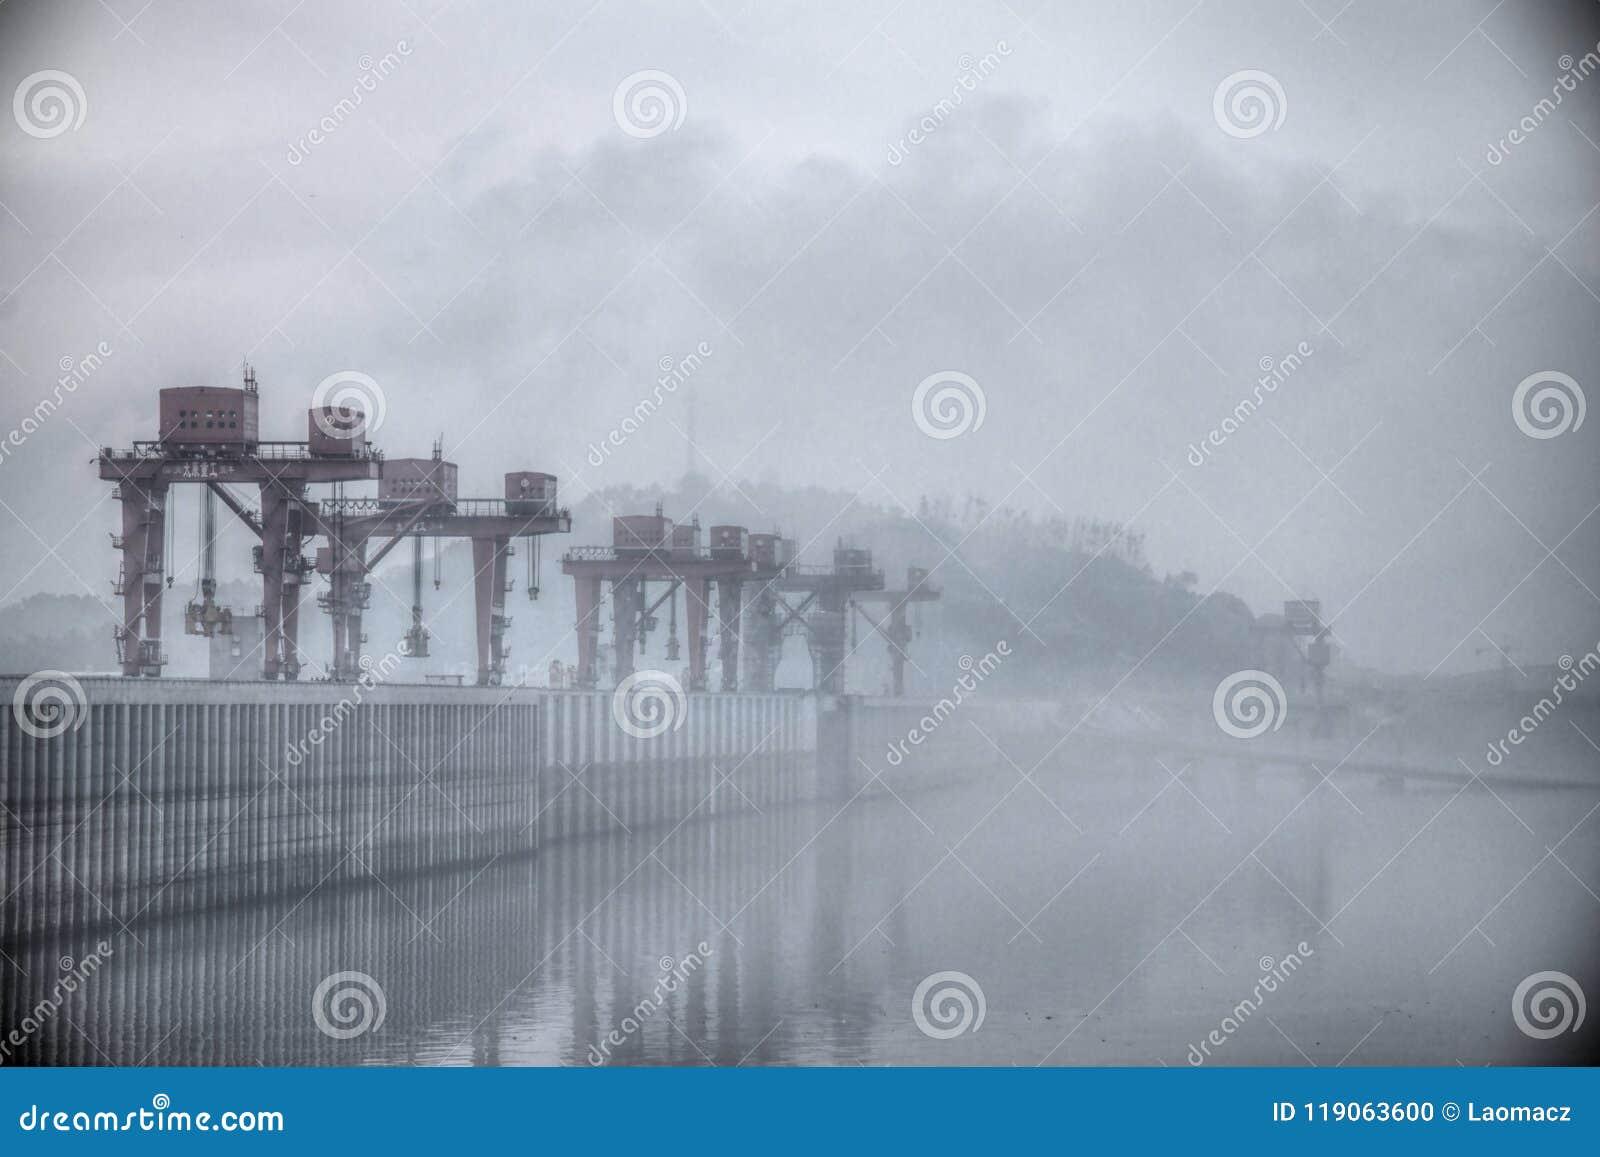 De Grootste Waterkrachtcentrale in de Wereld - Drie Klovendam op Yangtze-rivier in China